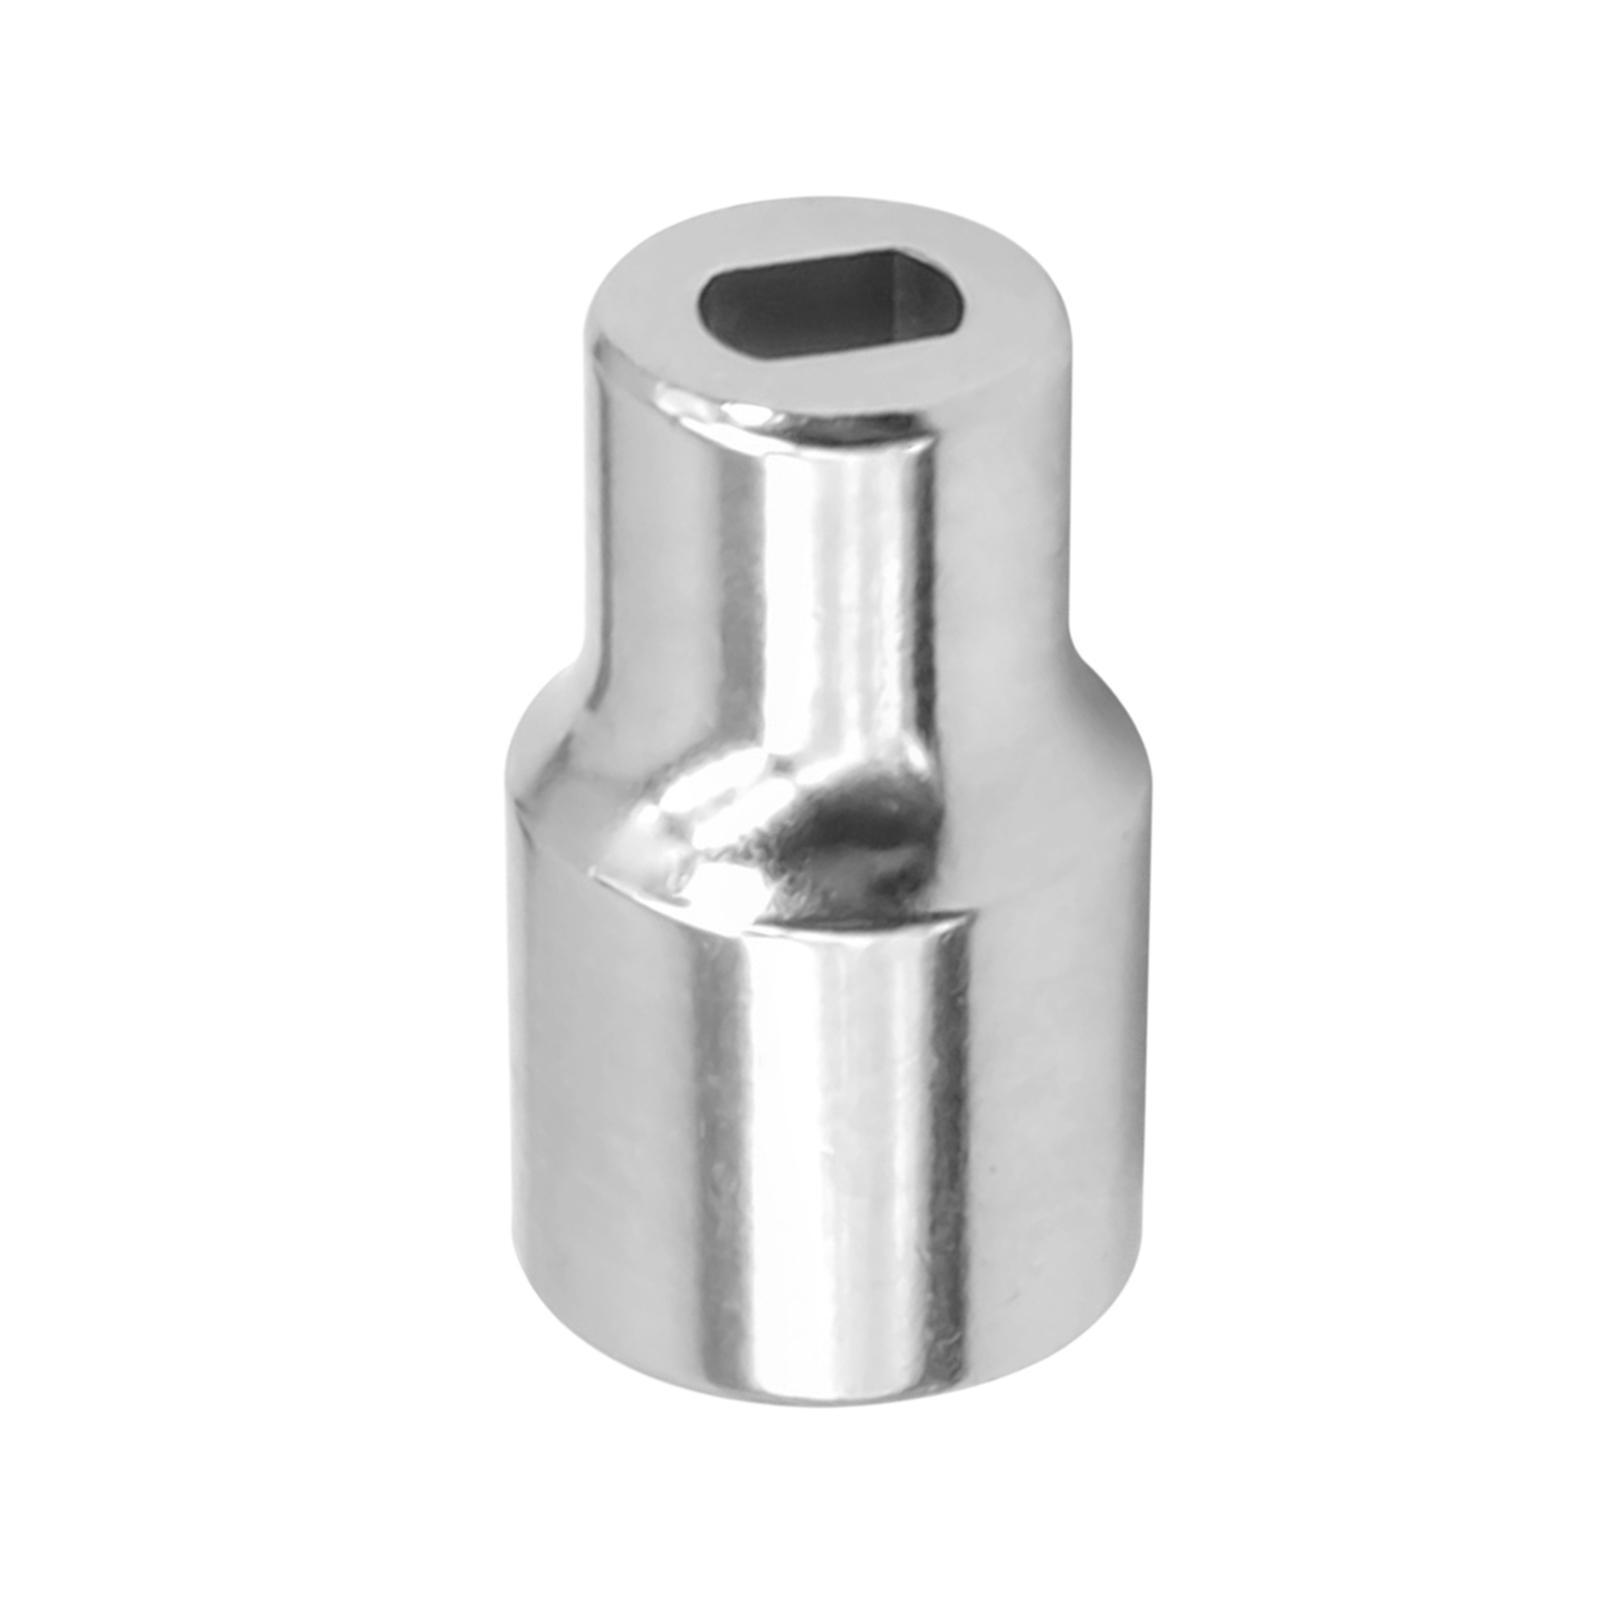 Amortiguadores hembra accionamiento 3/8 reemplazar quitar herramientas amortiguador para